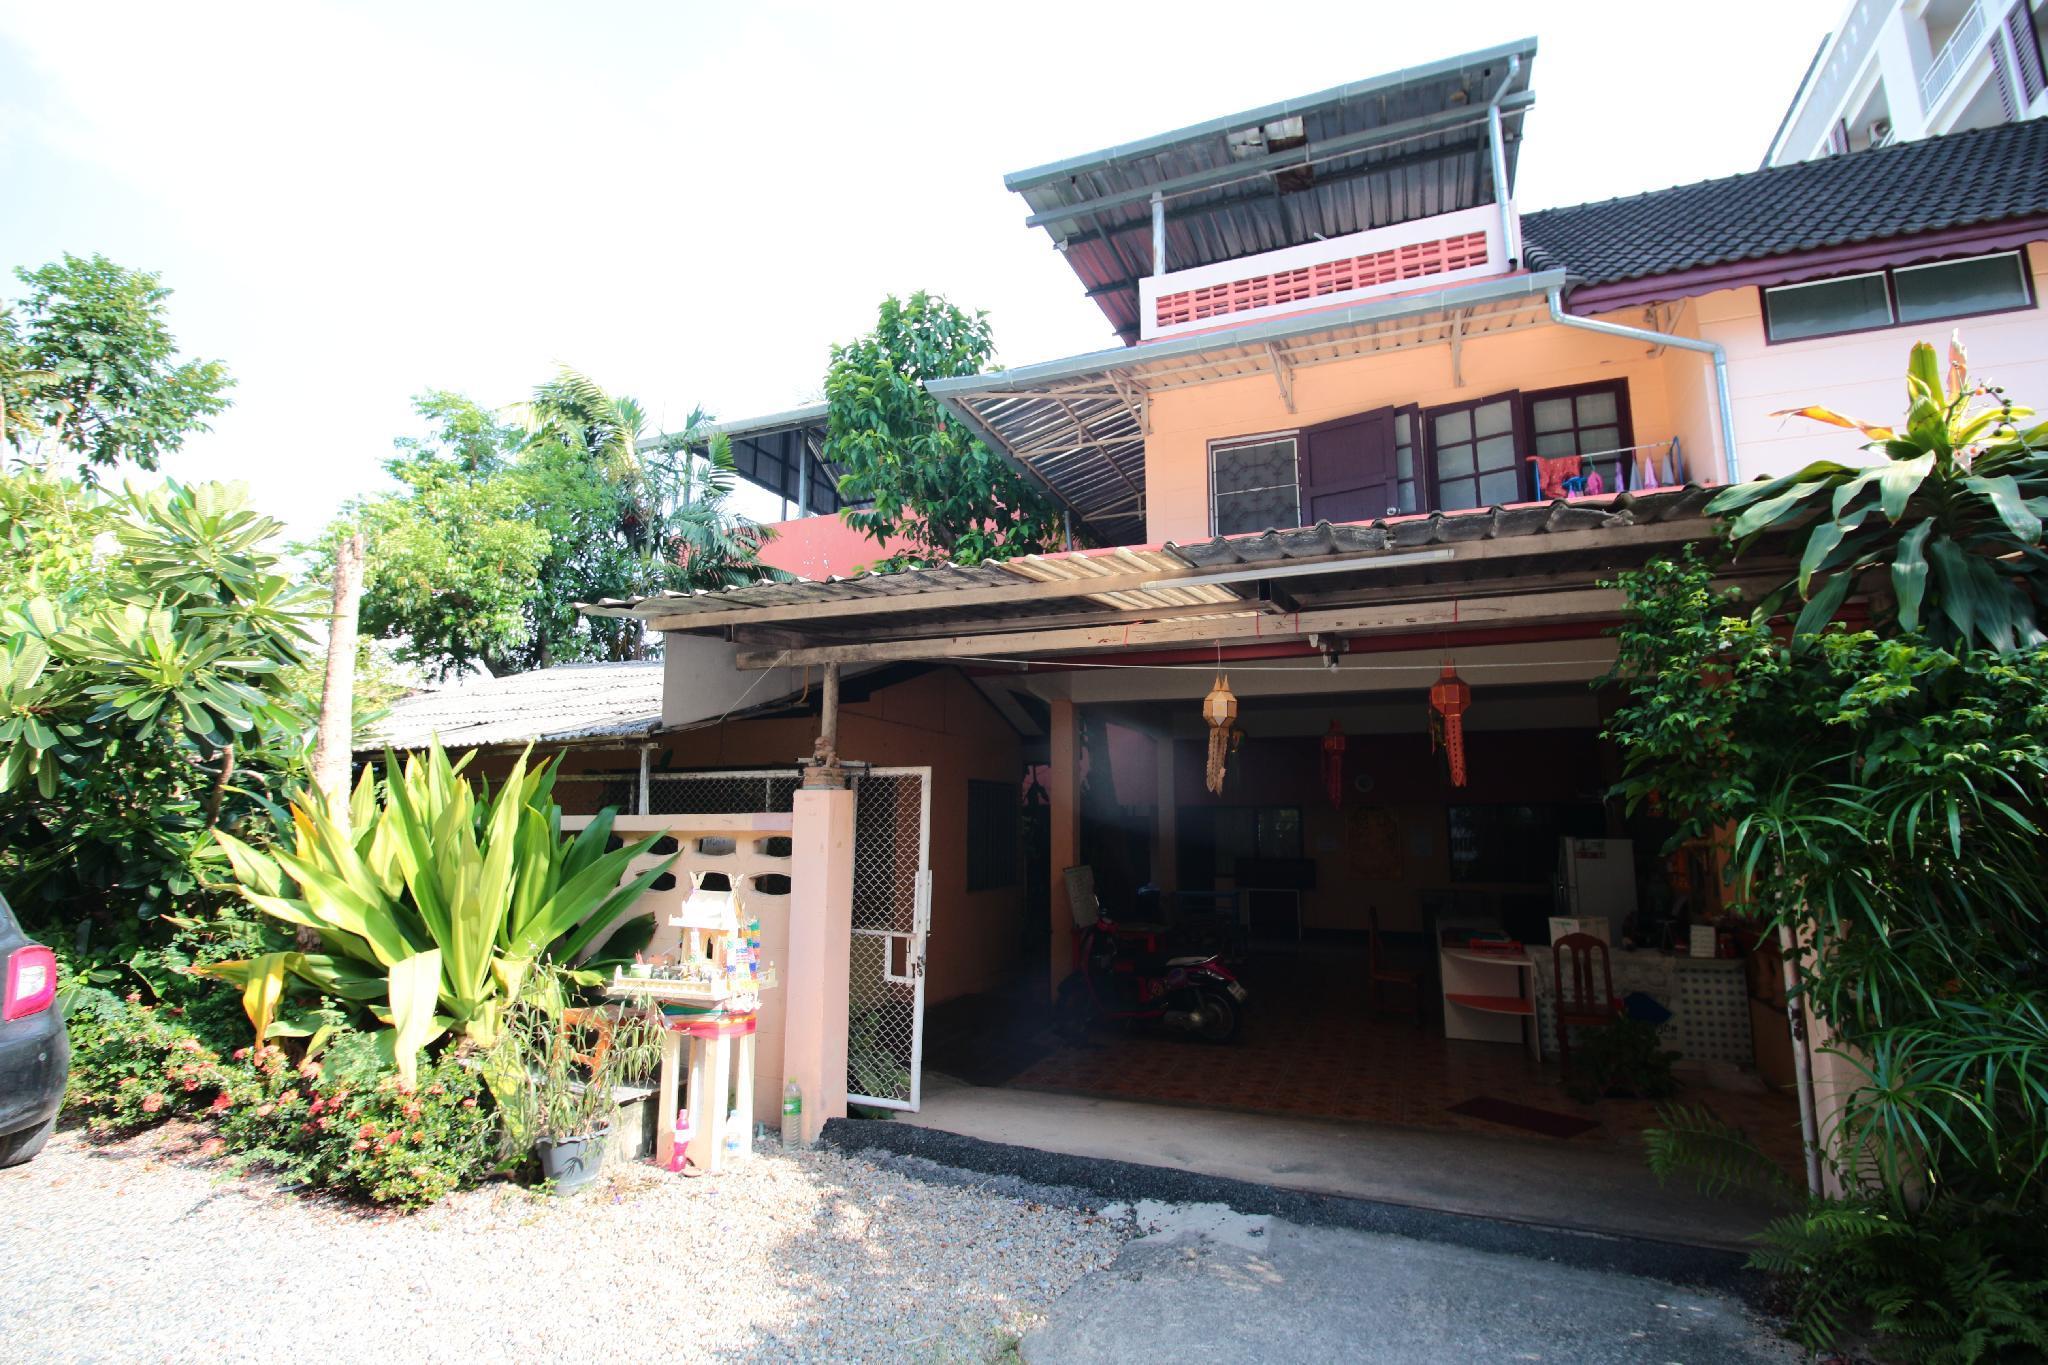 [CR] ฮัก ช้าง เฮ้าส์ (Hug Chang House) Pantip